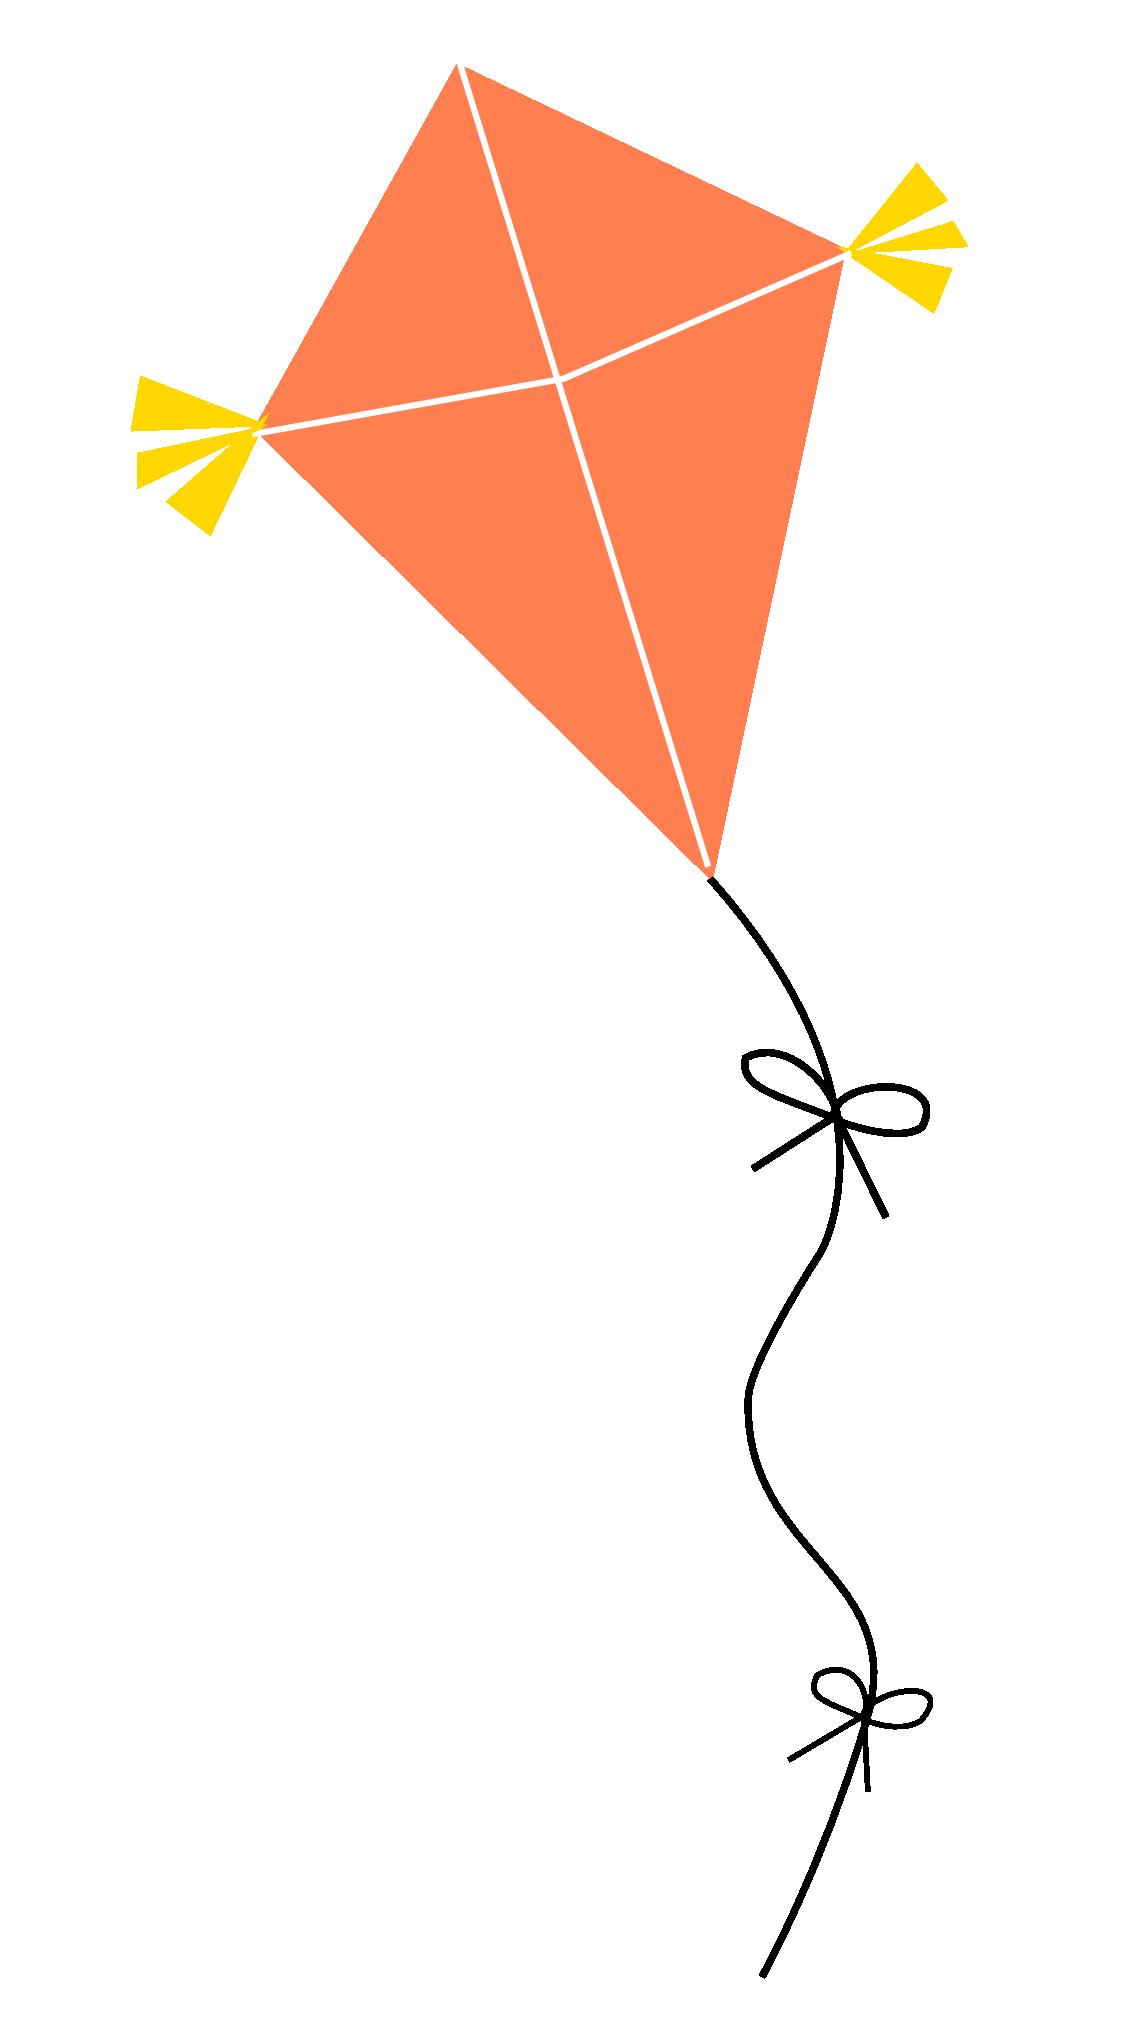 Clipart kite transparent background, Clipart kite.